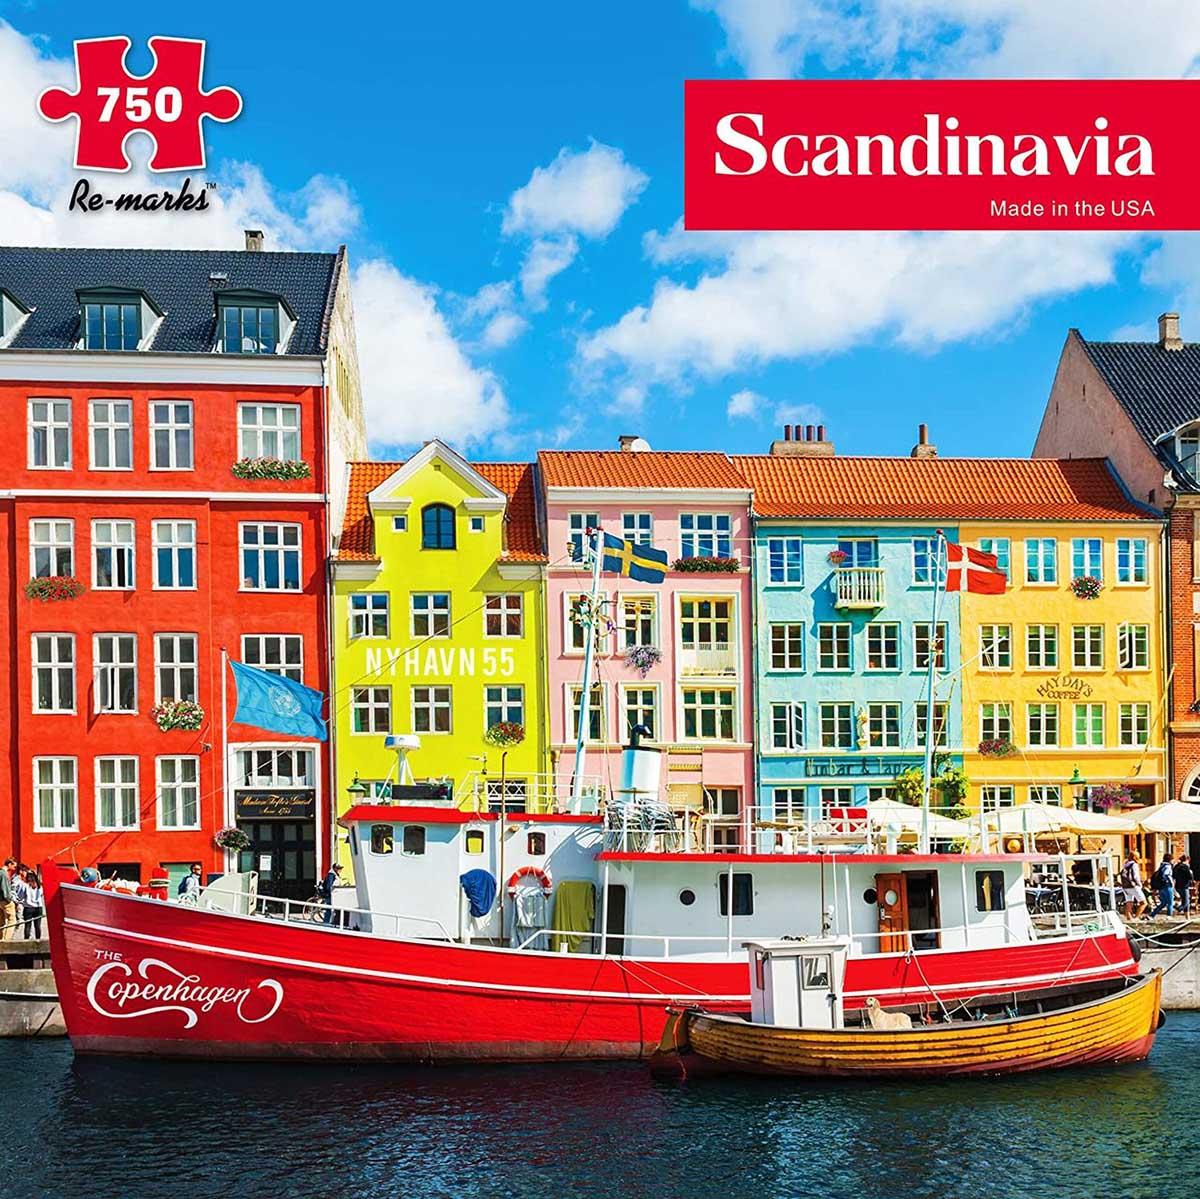 Scandinavia Boats Jigsaw Puzzle